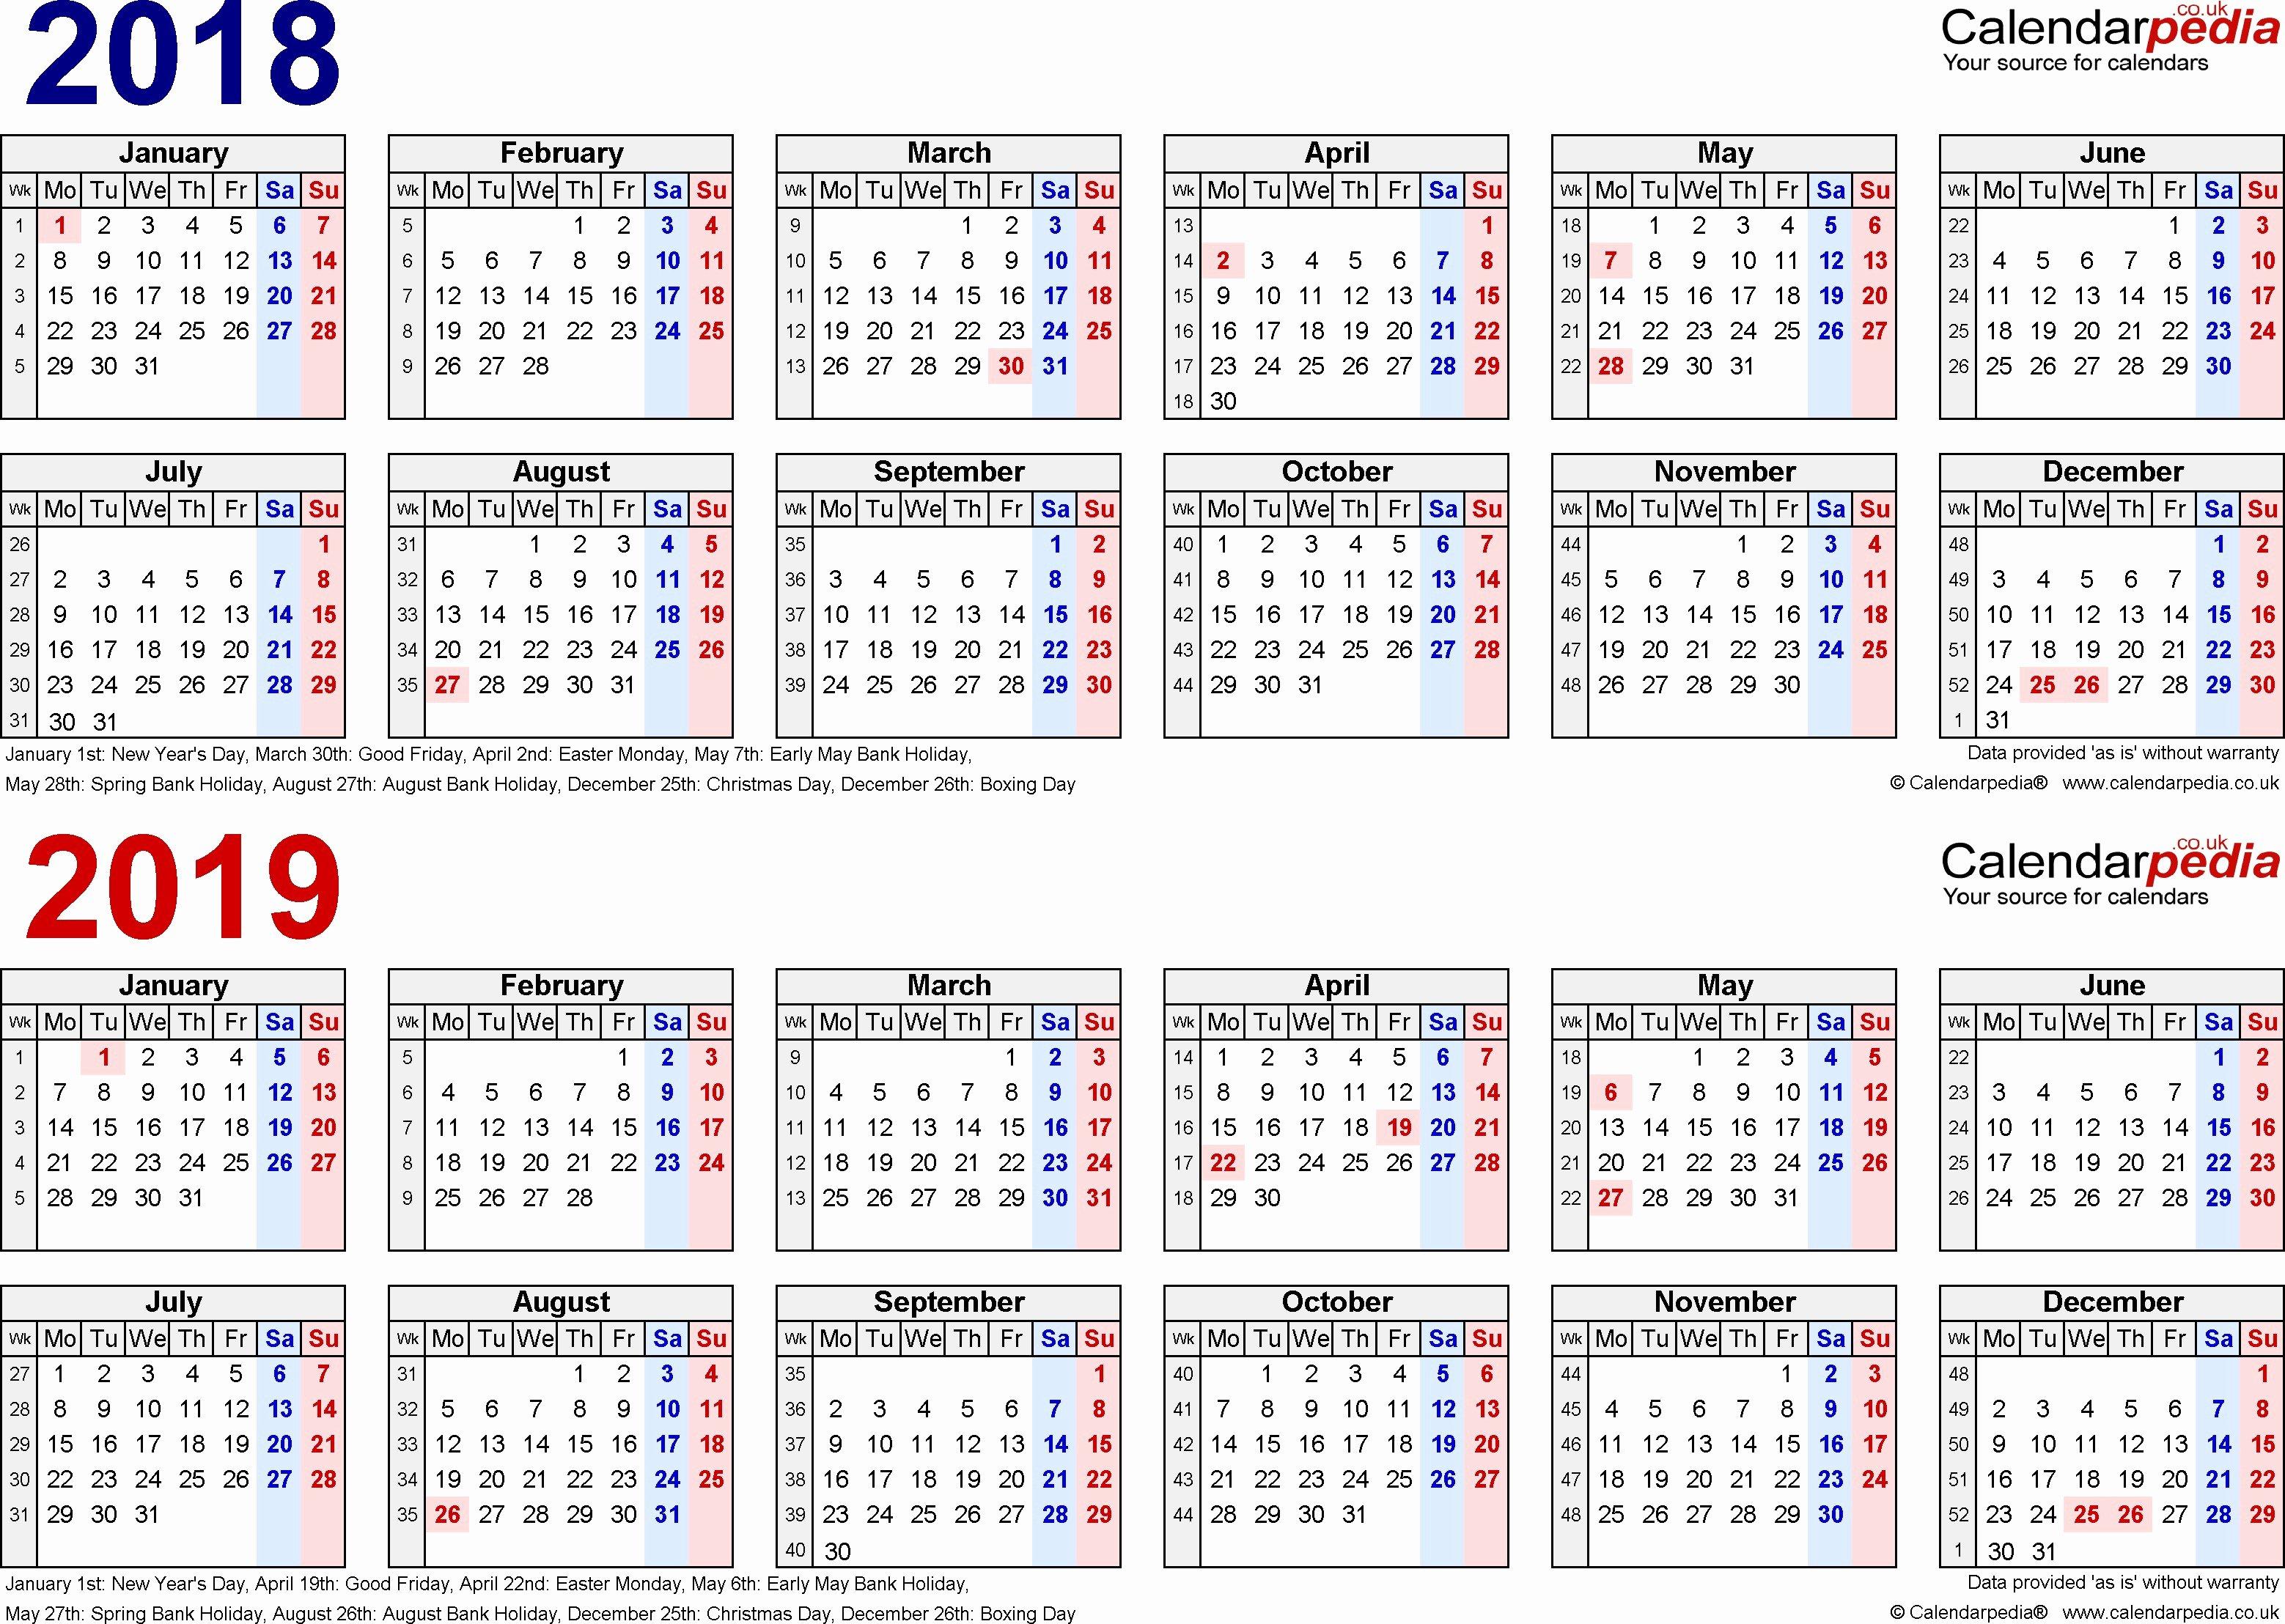 Biweekly Payroll Calendar Template 2019 Beautiful Pay Period Calendar Bi Weekly 2018